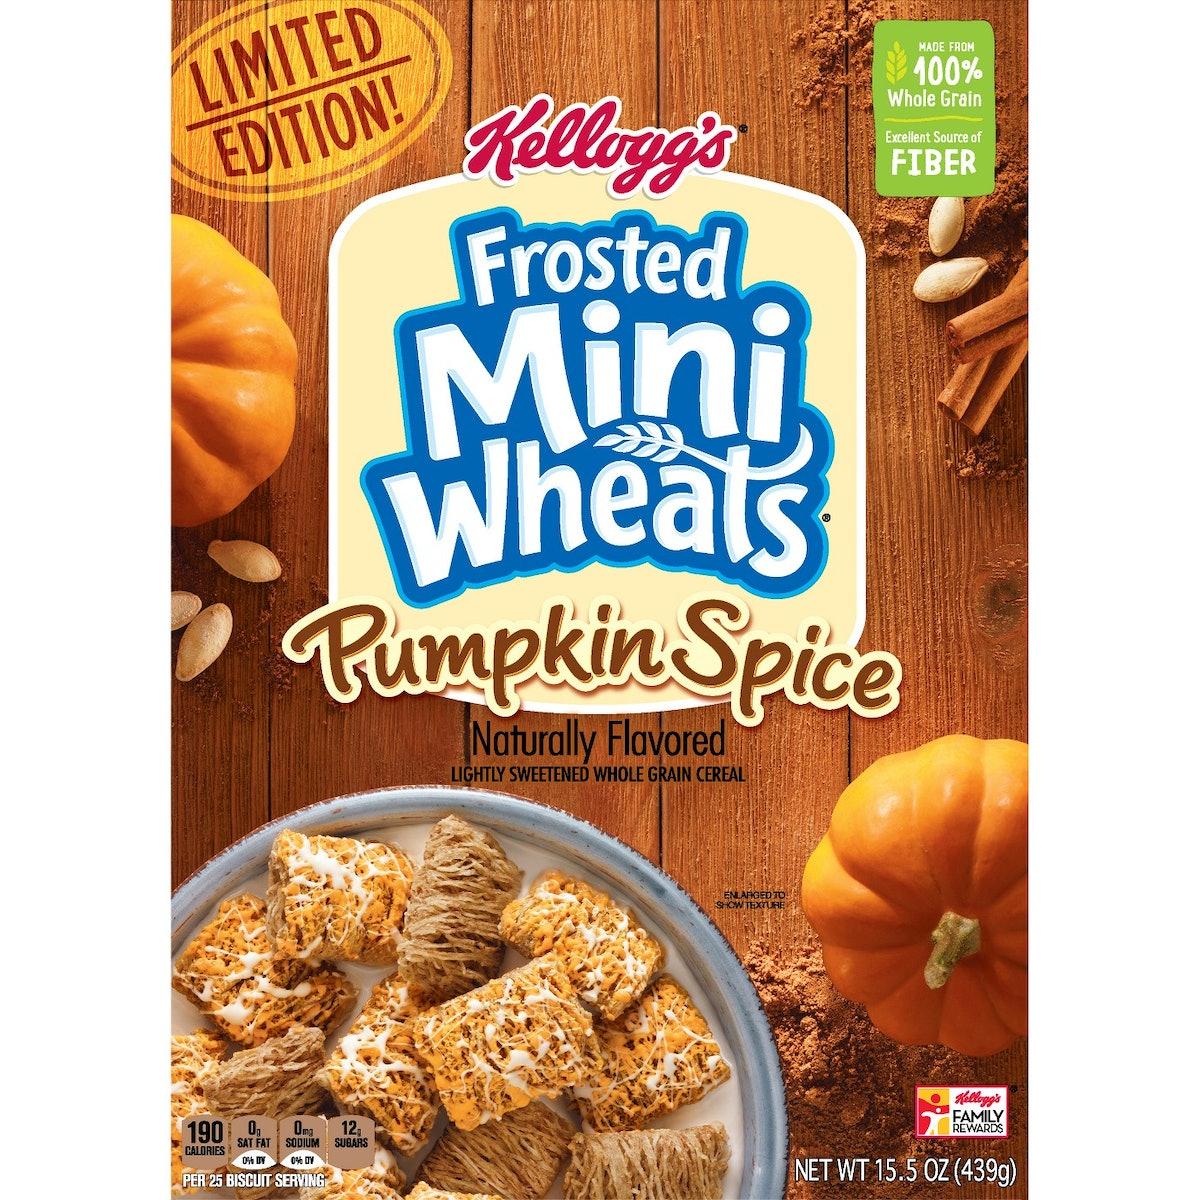 Frosted Mini Wheats Pumpkin Spice Breakfast Cereal